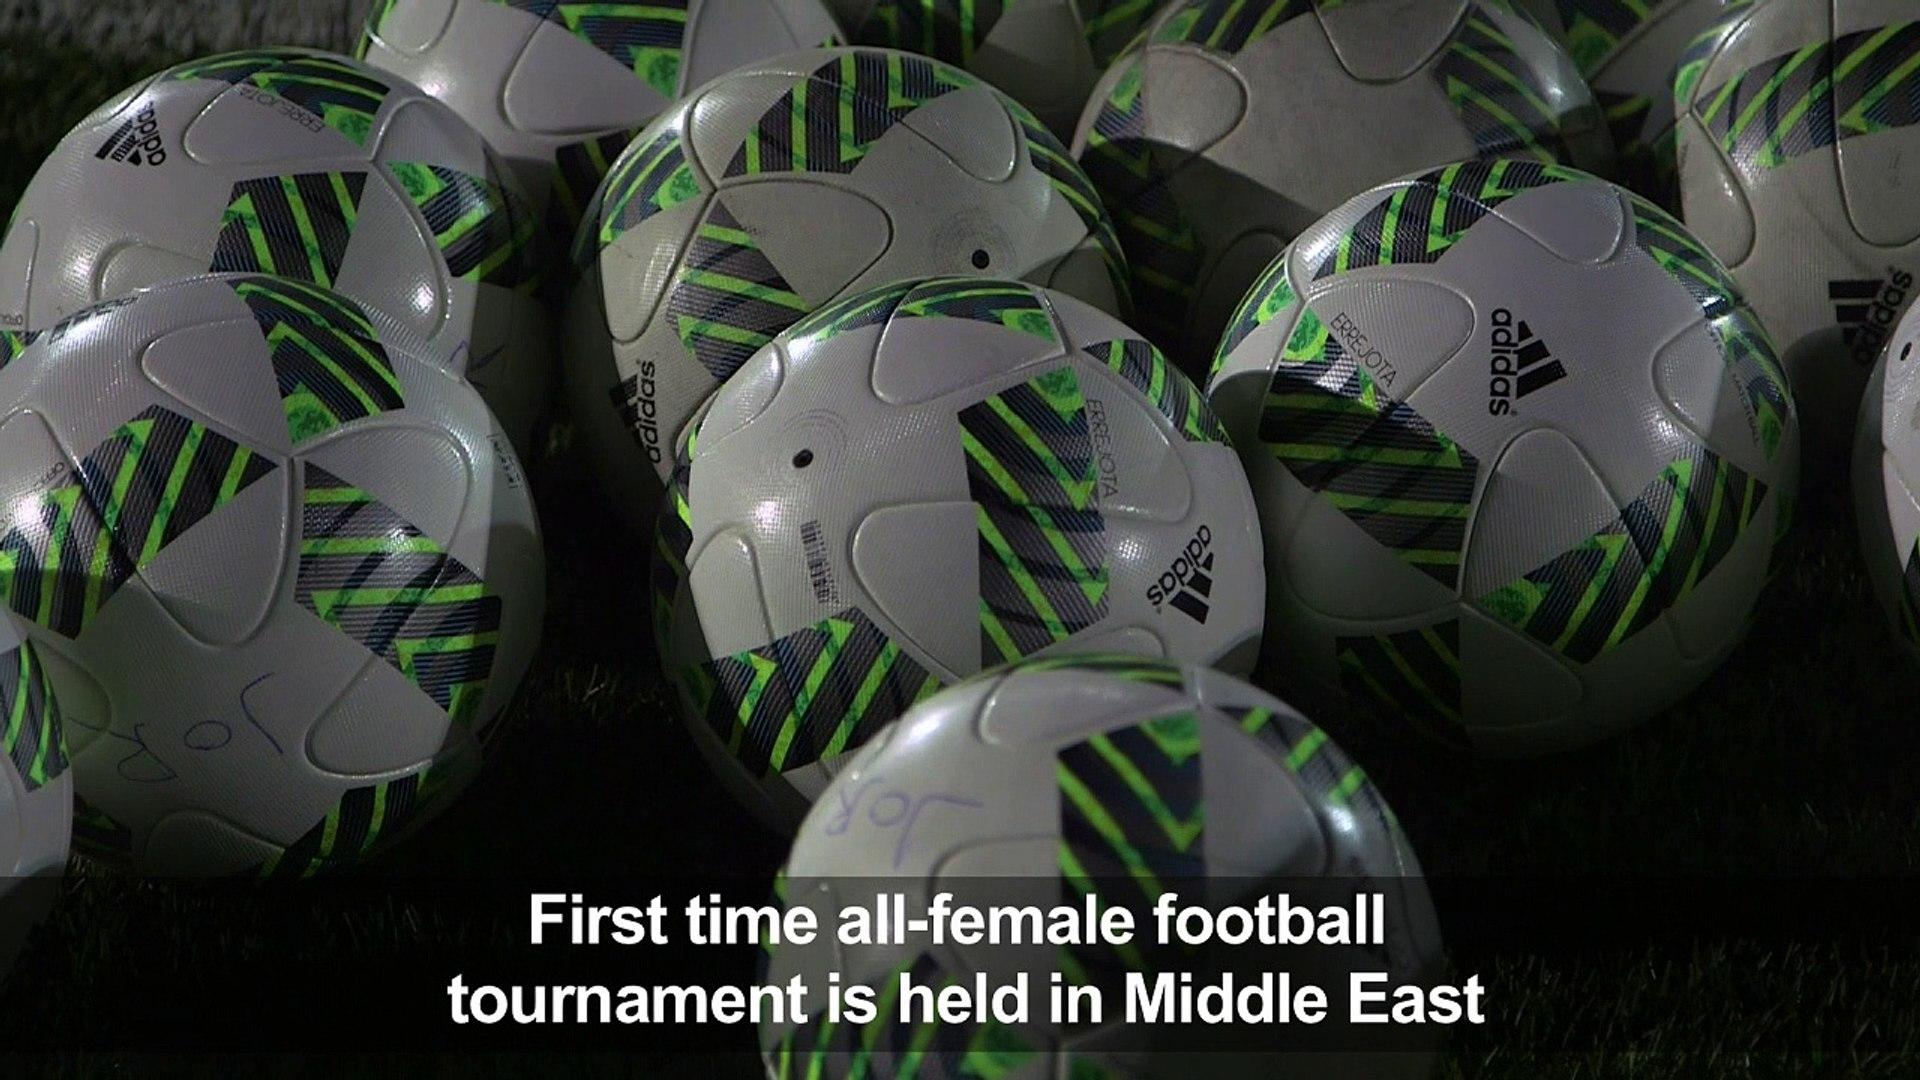 Jordan's under-17 women football team prepare to host World Cup